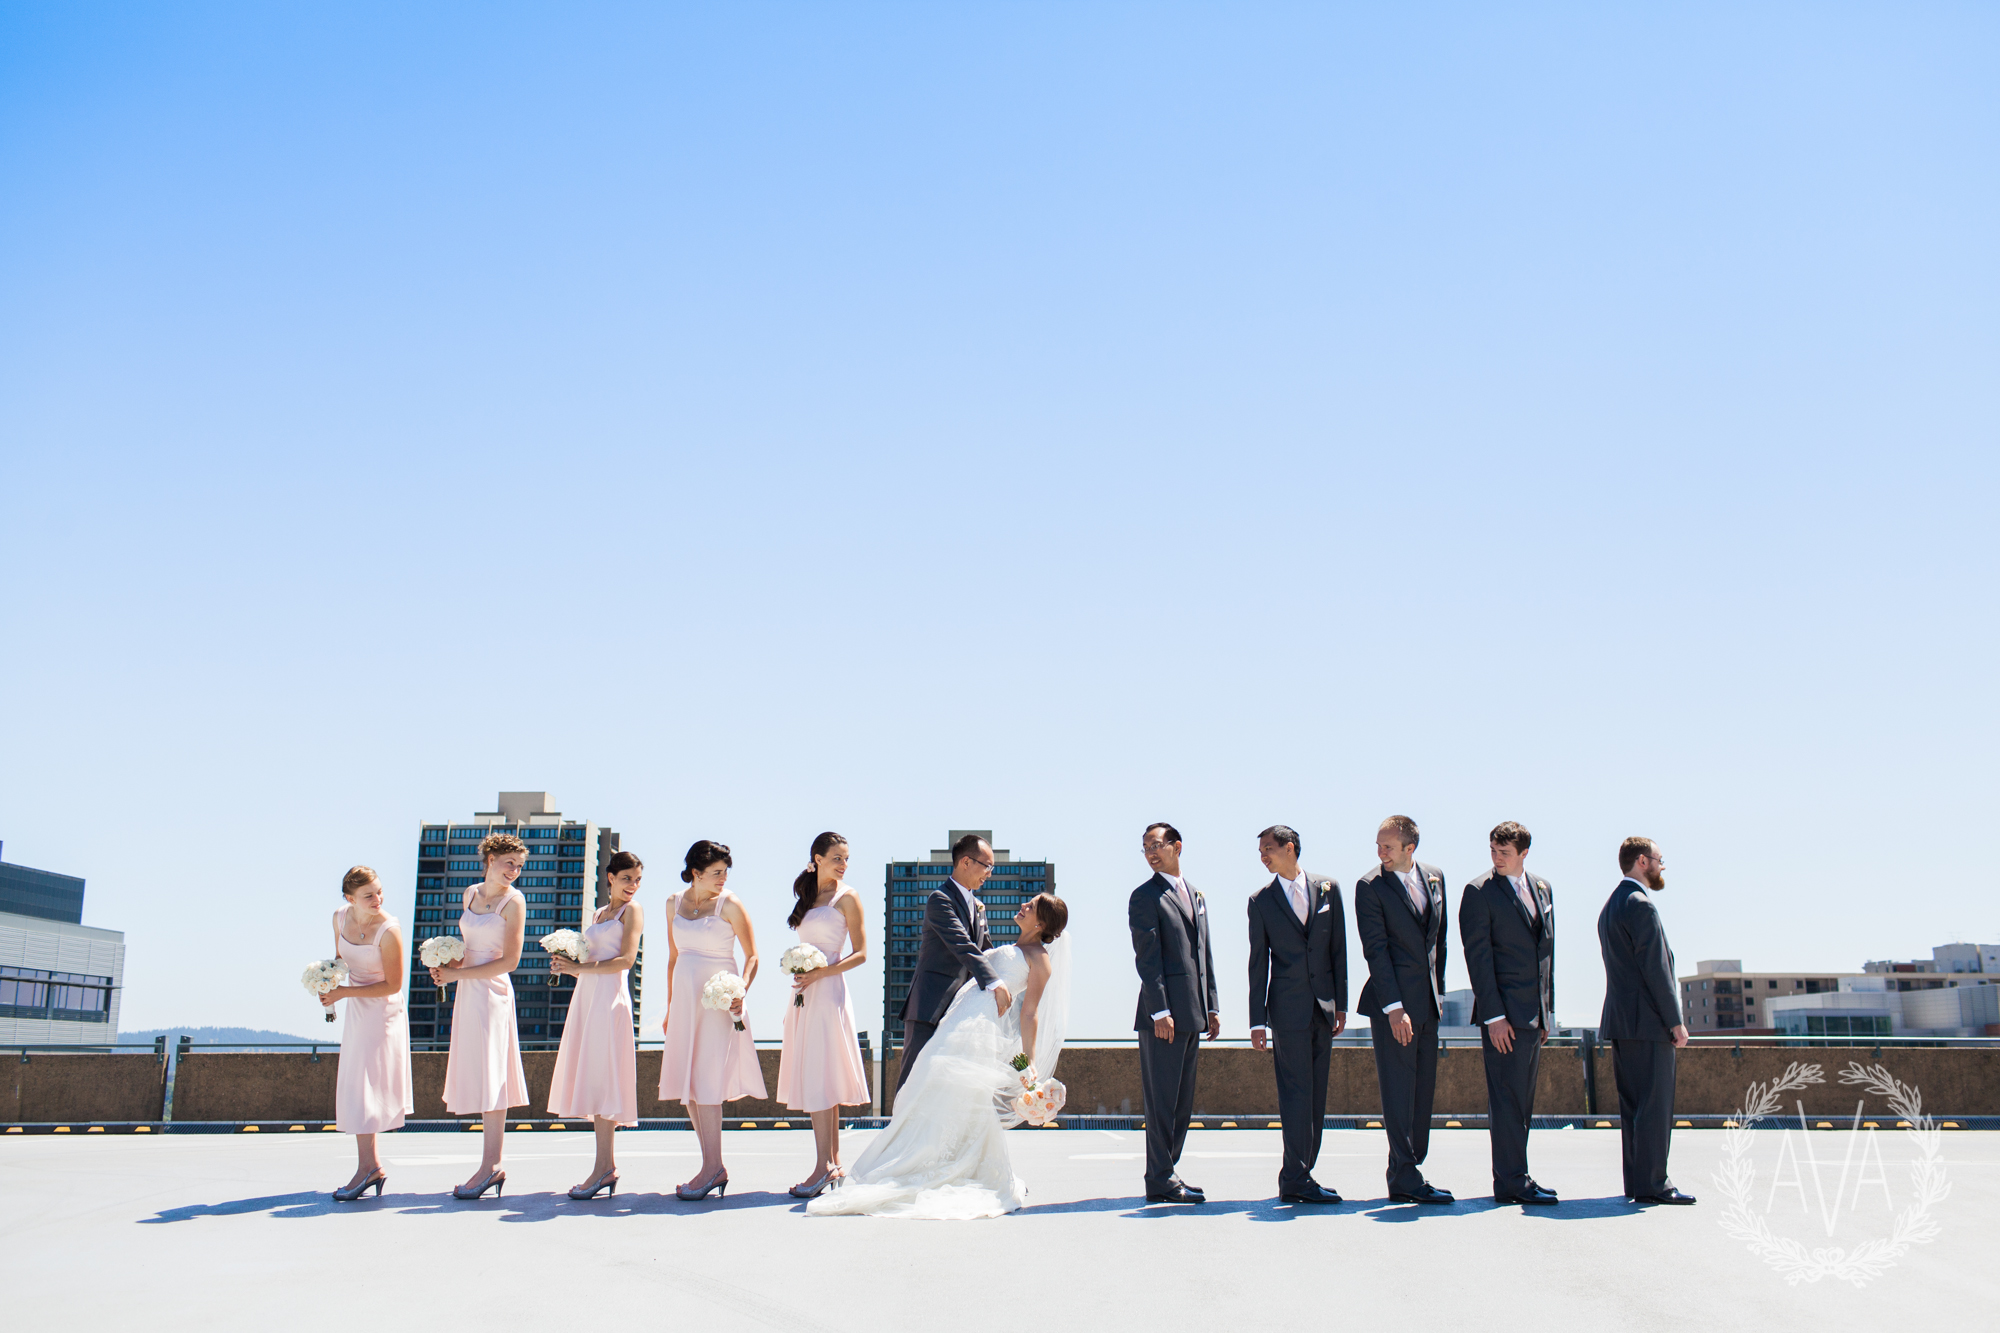 ava_chiew_wedding-28.jpg